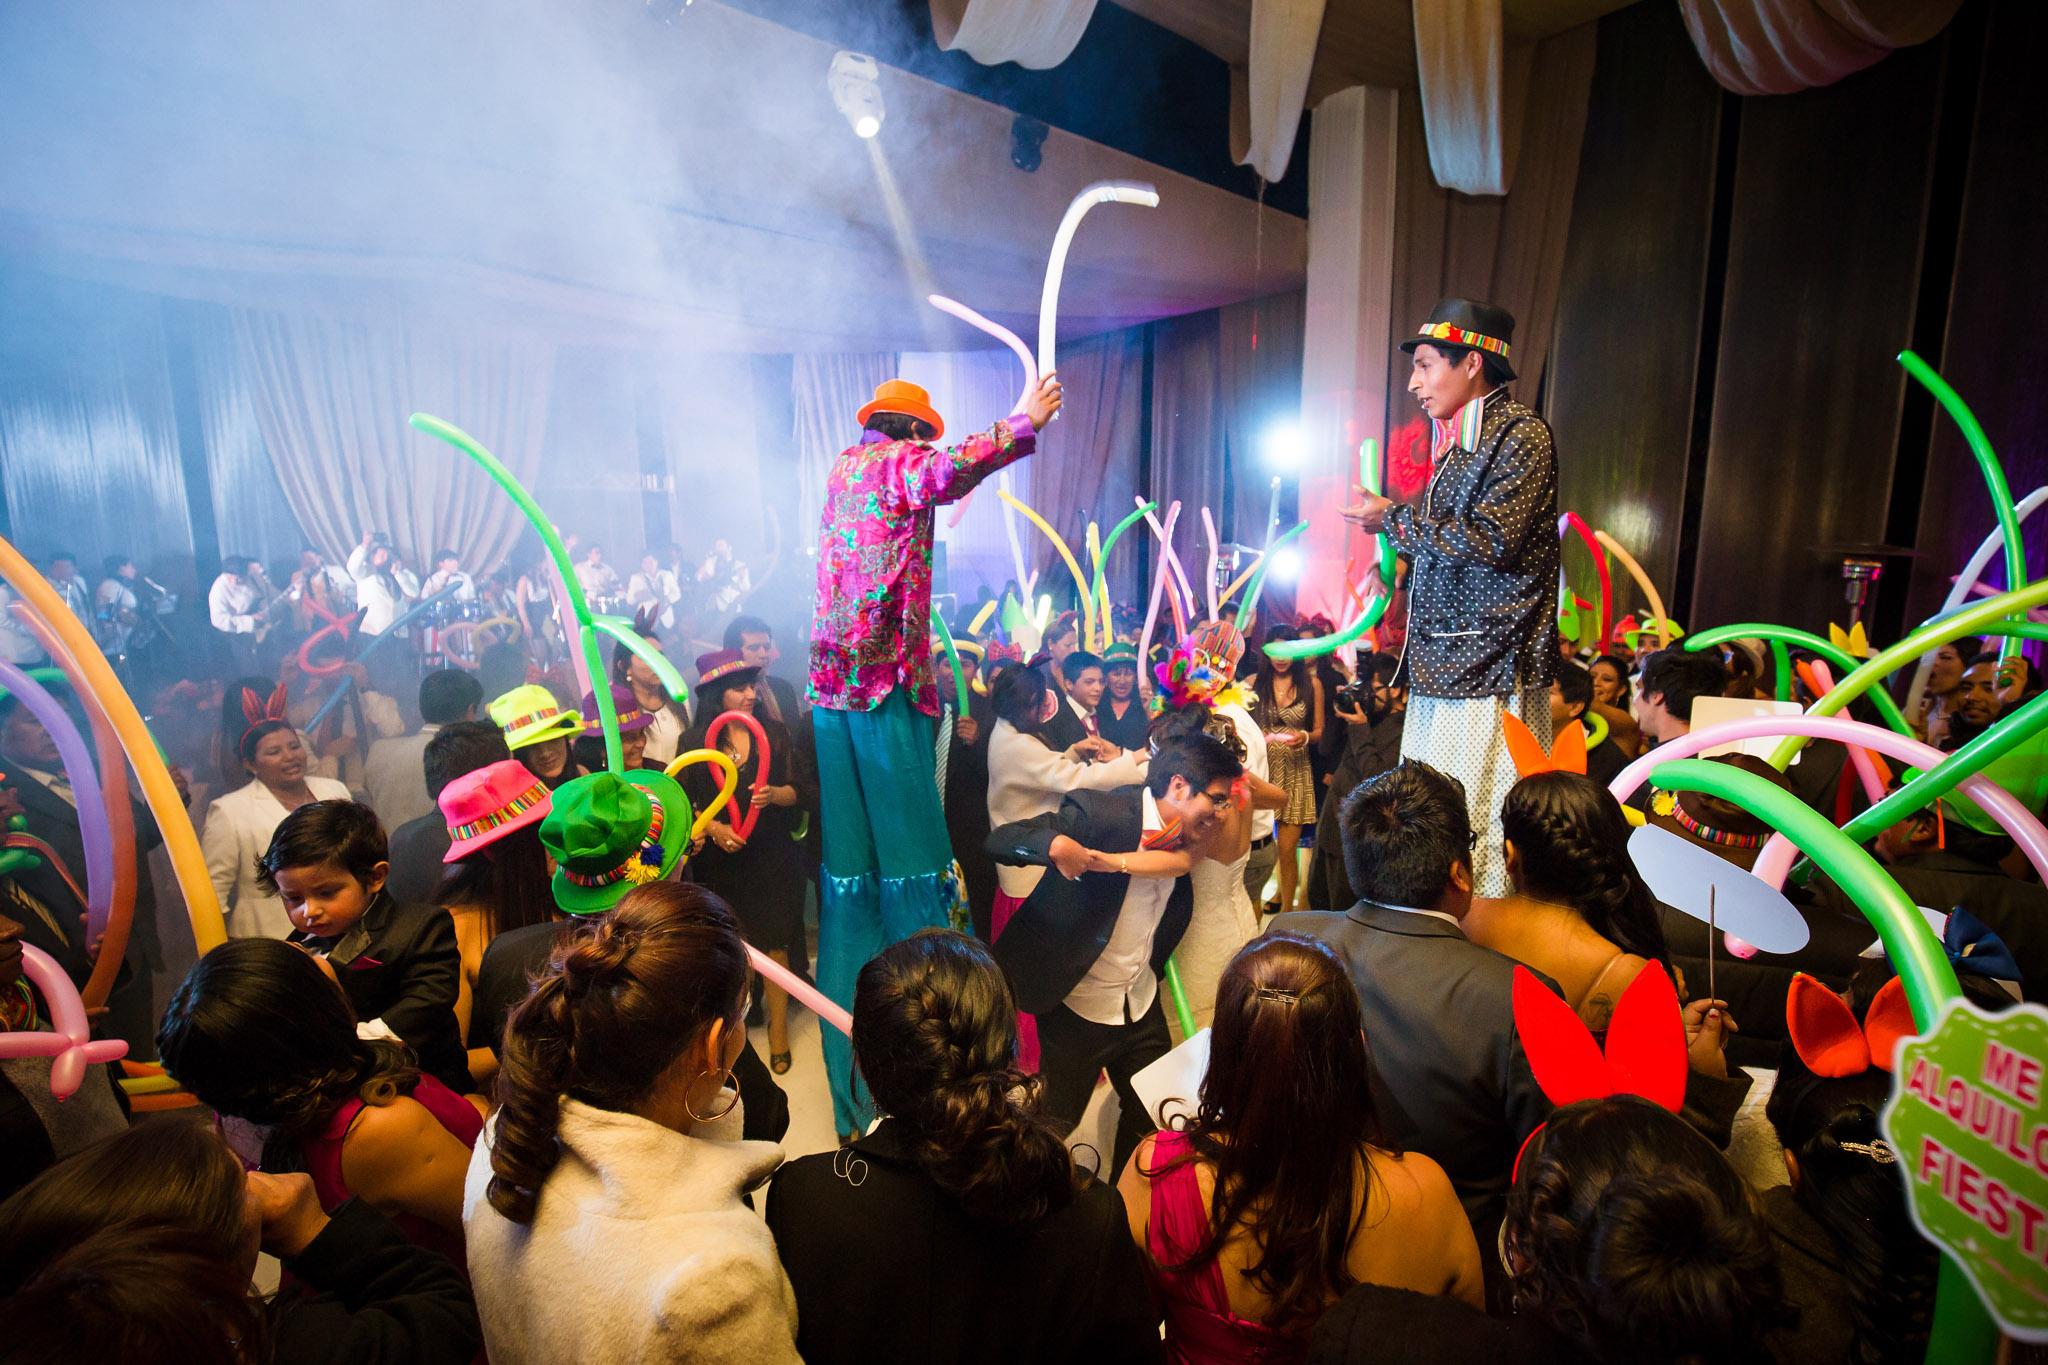 Wedding-Travellers-Destination-Wedding-Peru-Cusco-Hacienda-Sarapampa-Sacred-Valley-party